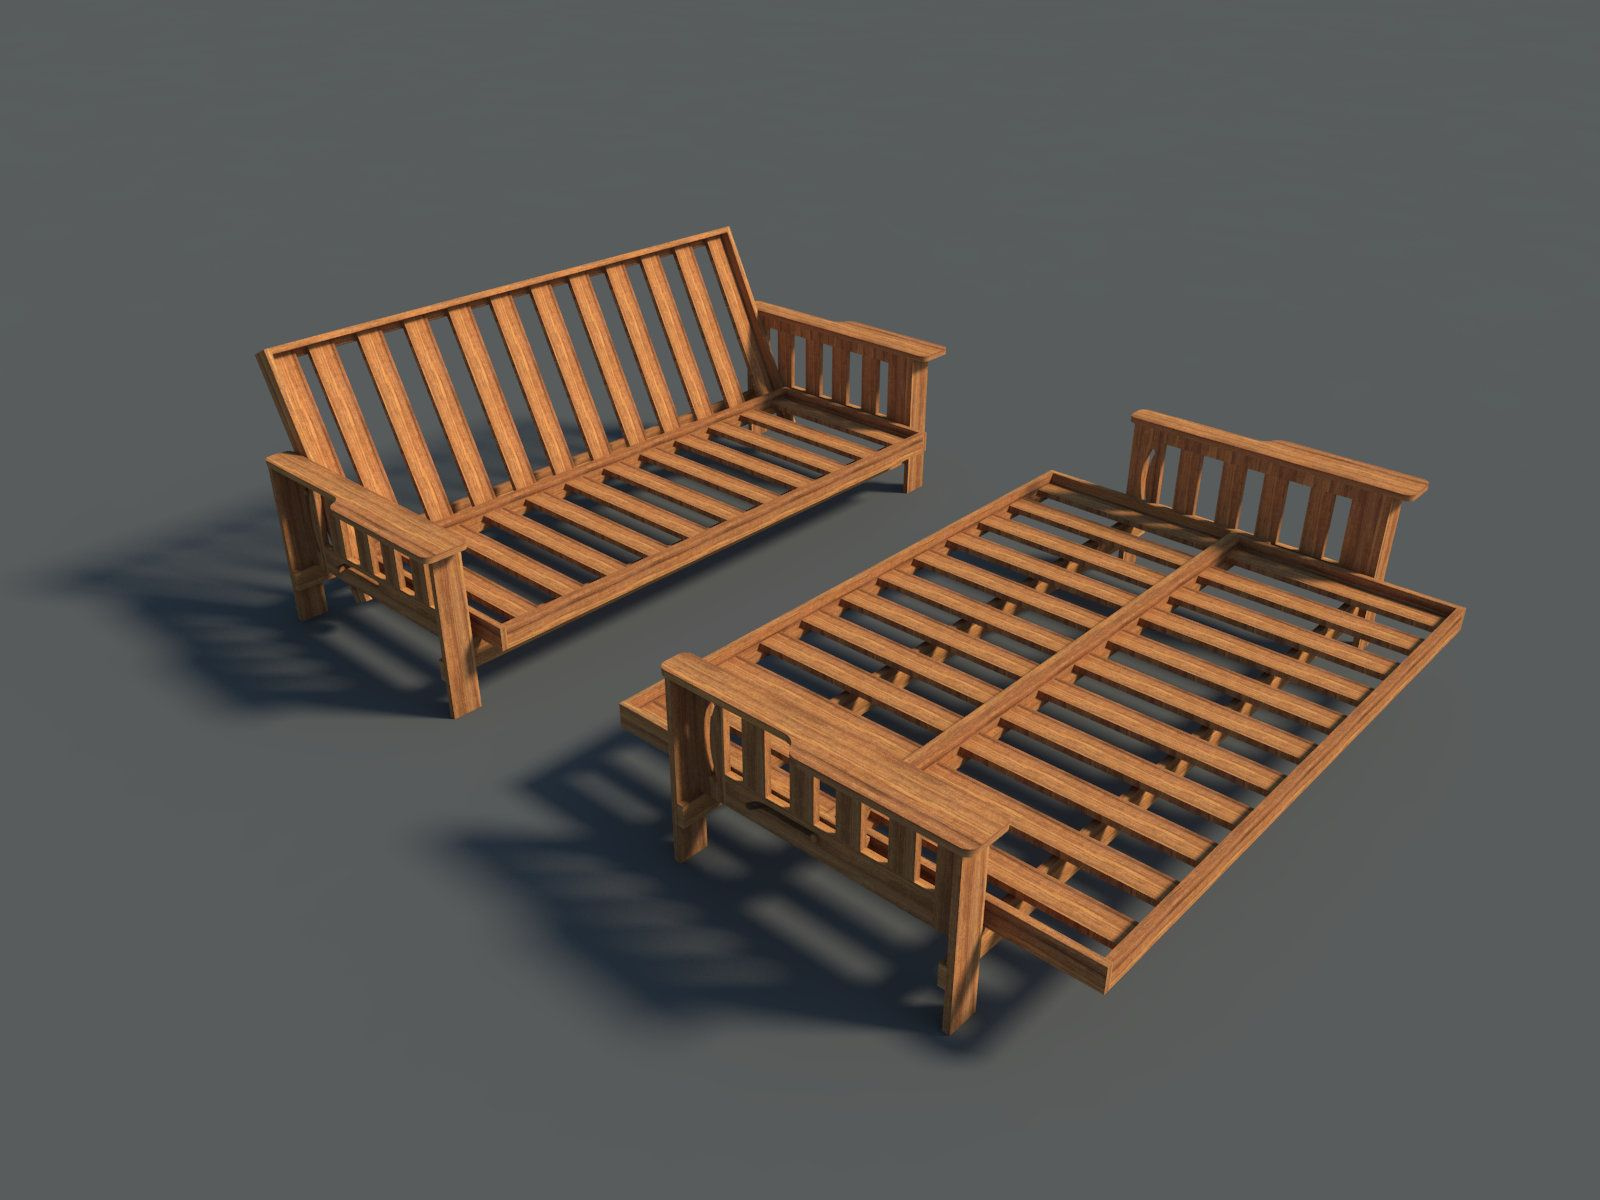 Futon Sofa Bed Plans Diy Lounger Couch Sleeper Furniture Etsy Futon Bed Frames Diy Futon Futon Frame